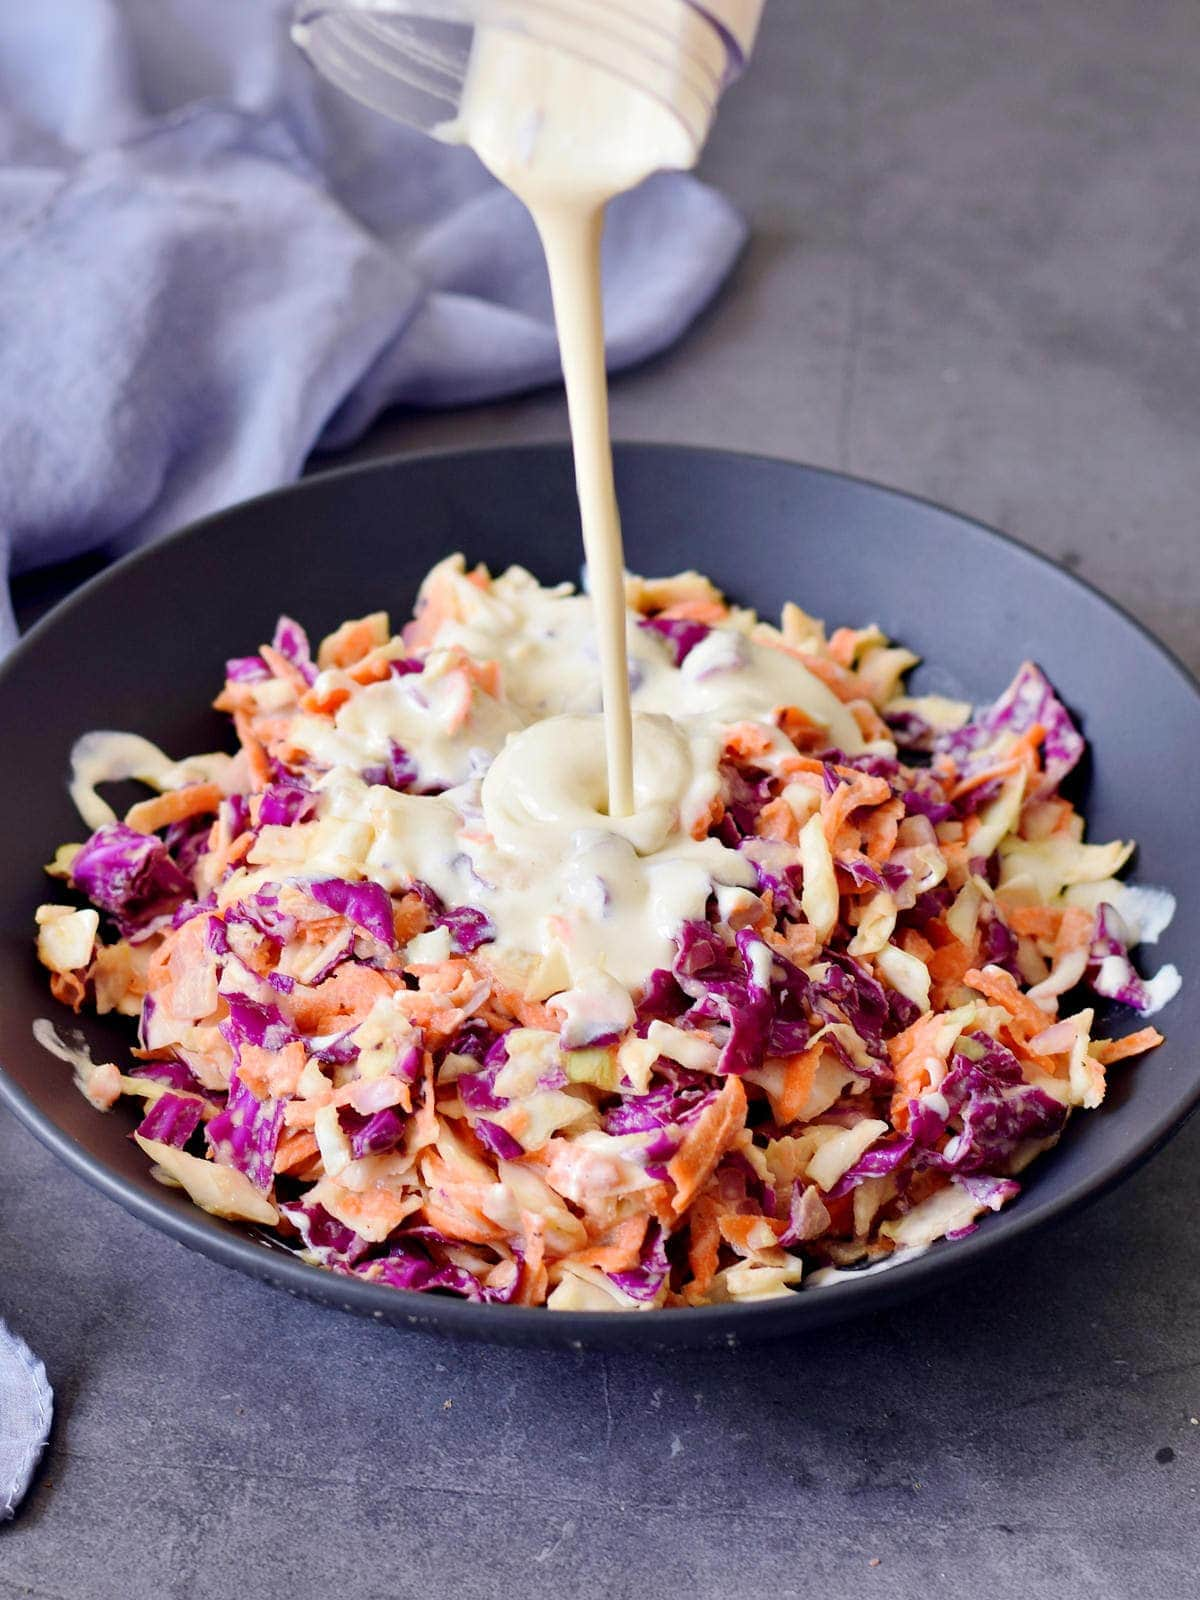 Veganer Schmand wird über Coleslaw (amerikanischer Krautsalat) gegossen